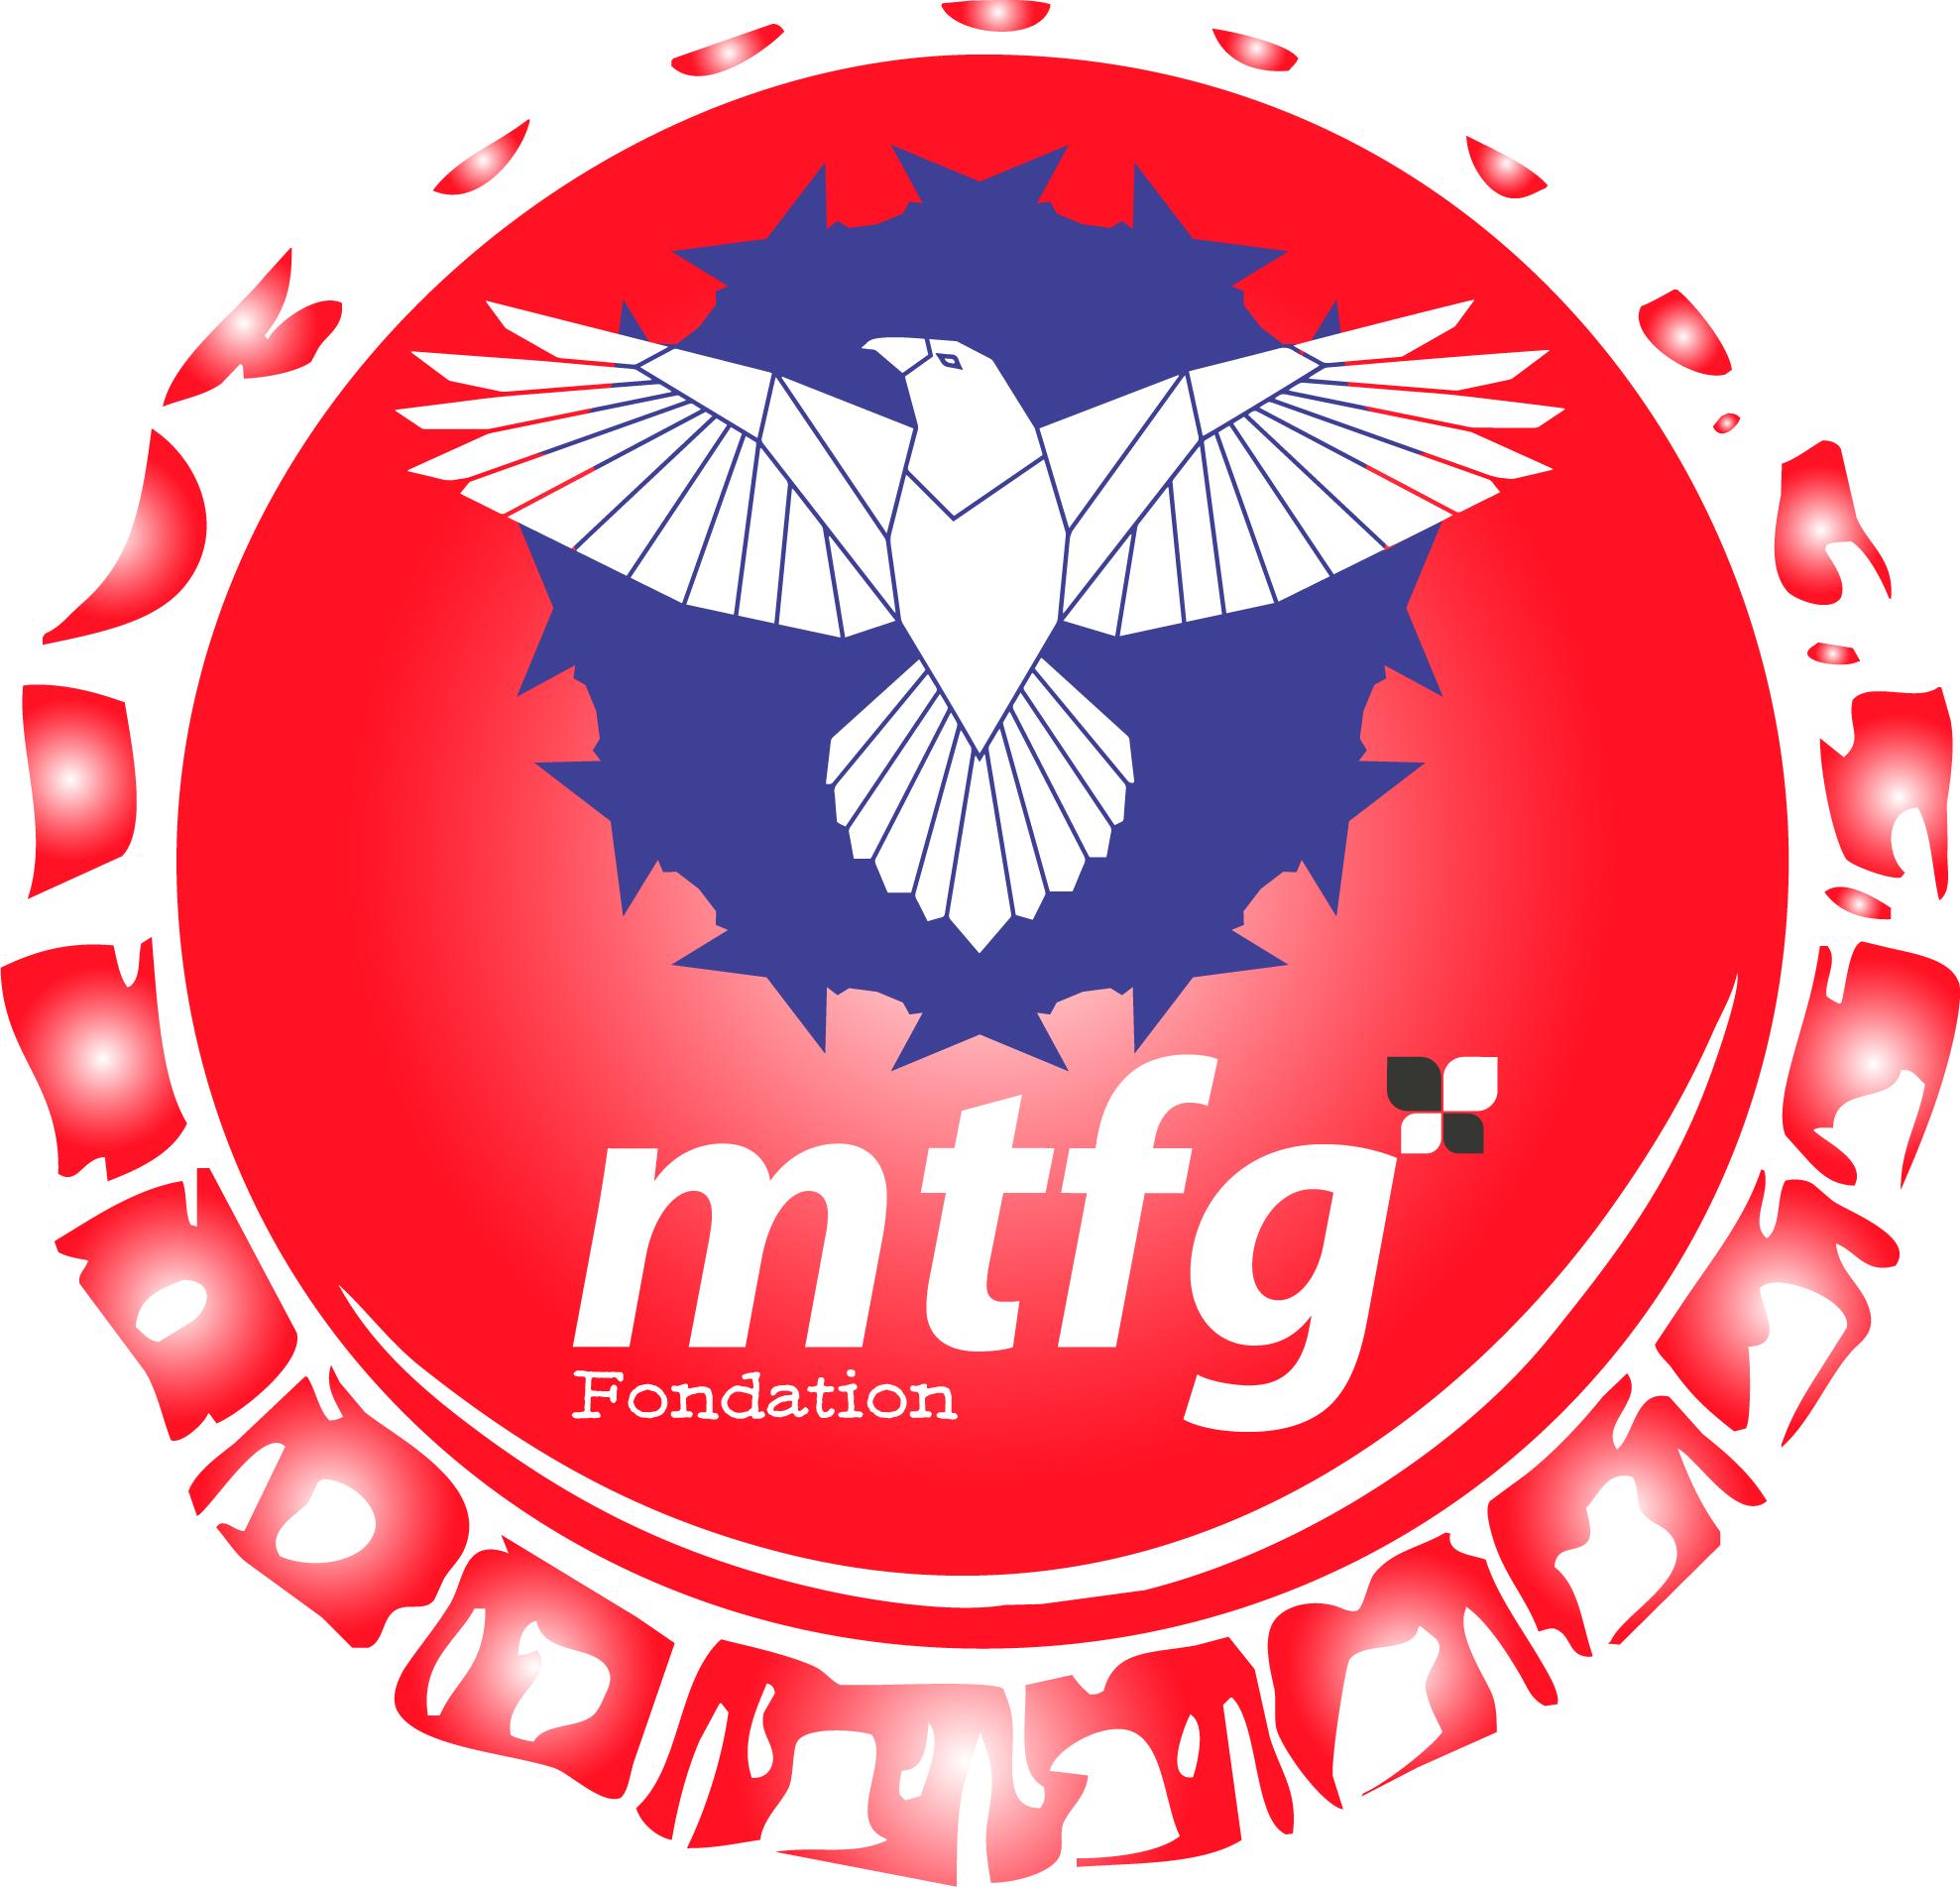 MTFG Fondation